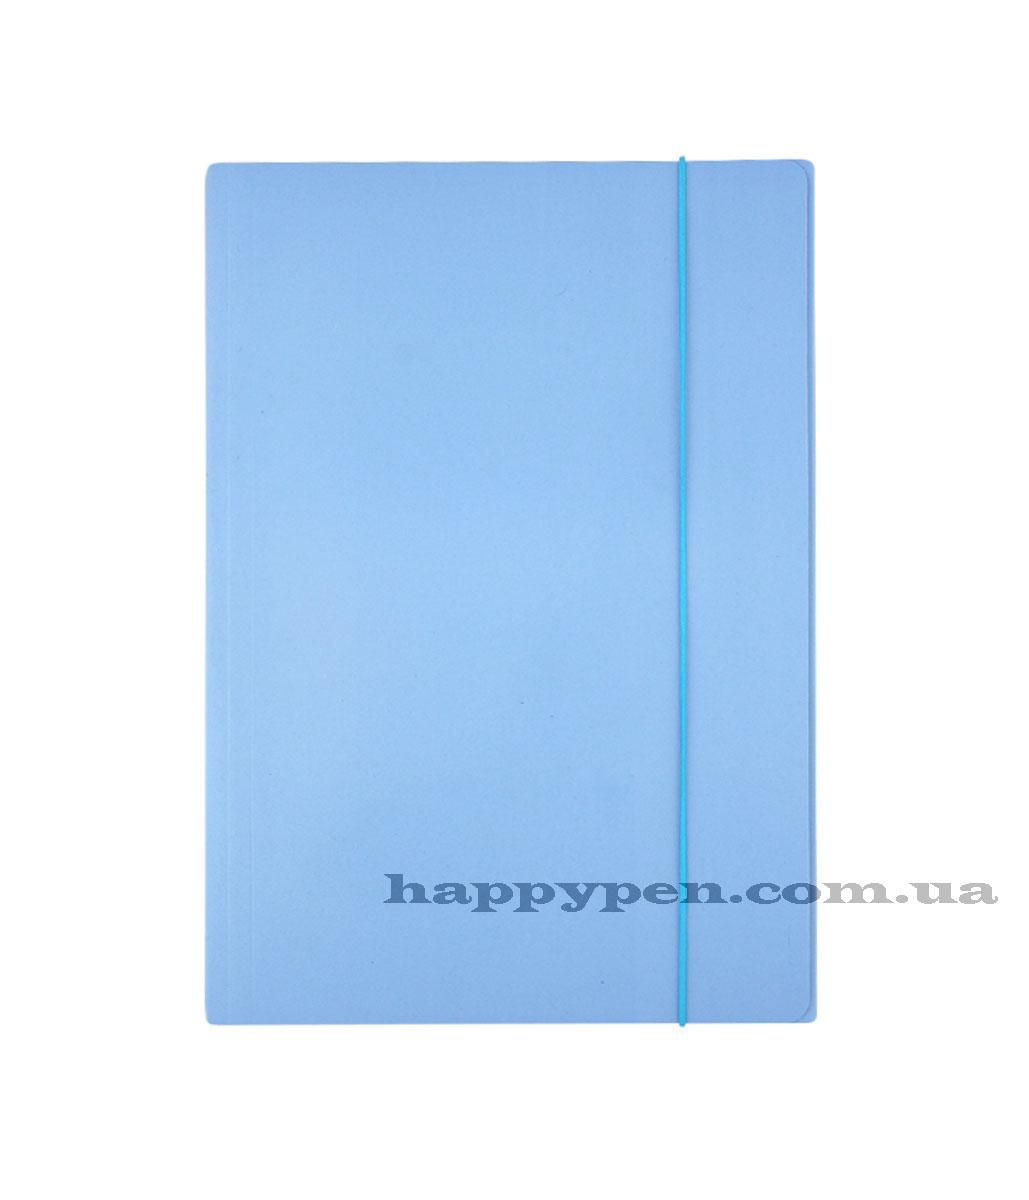 Папка на резинках А4, картон, небесно голуб. Penmate - фото 1